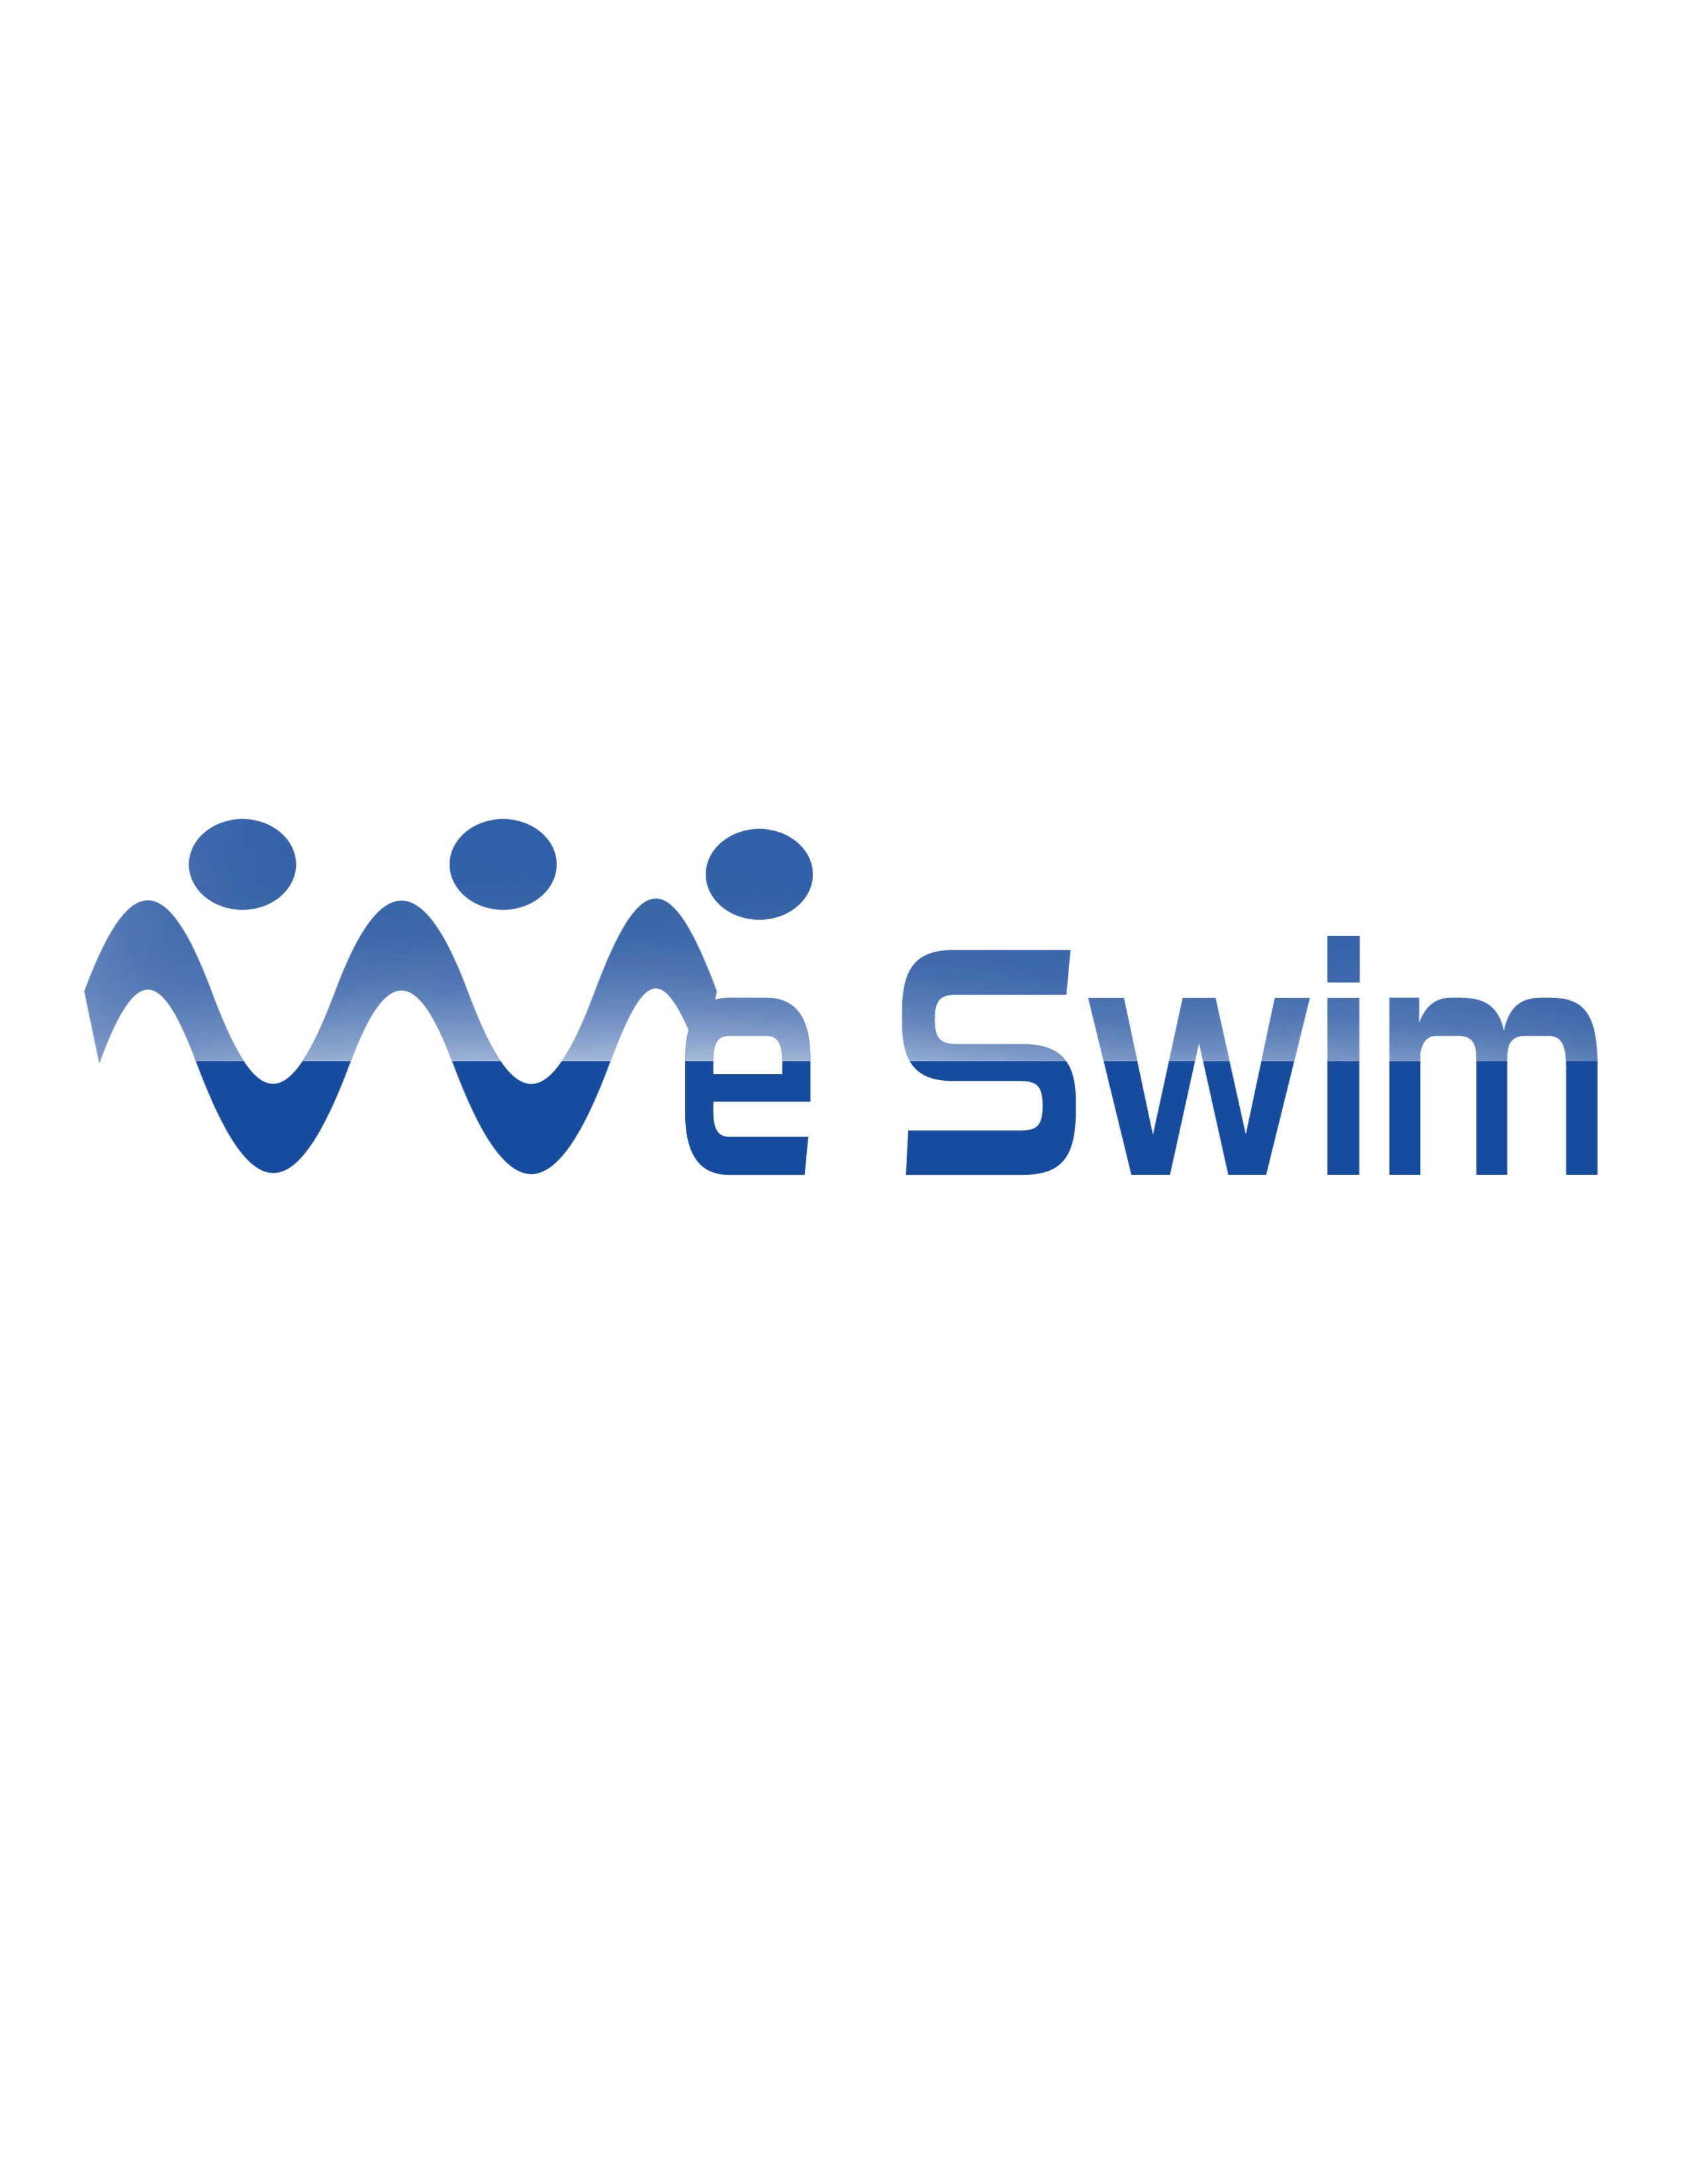 Logo Design by Mary Ann Balantac - Entry No. 89 in the Logo Design Contest Captivating Logo Design for We Swim.